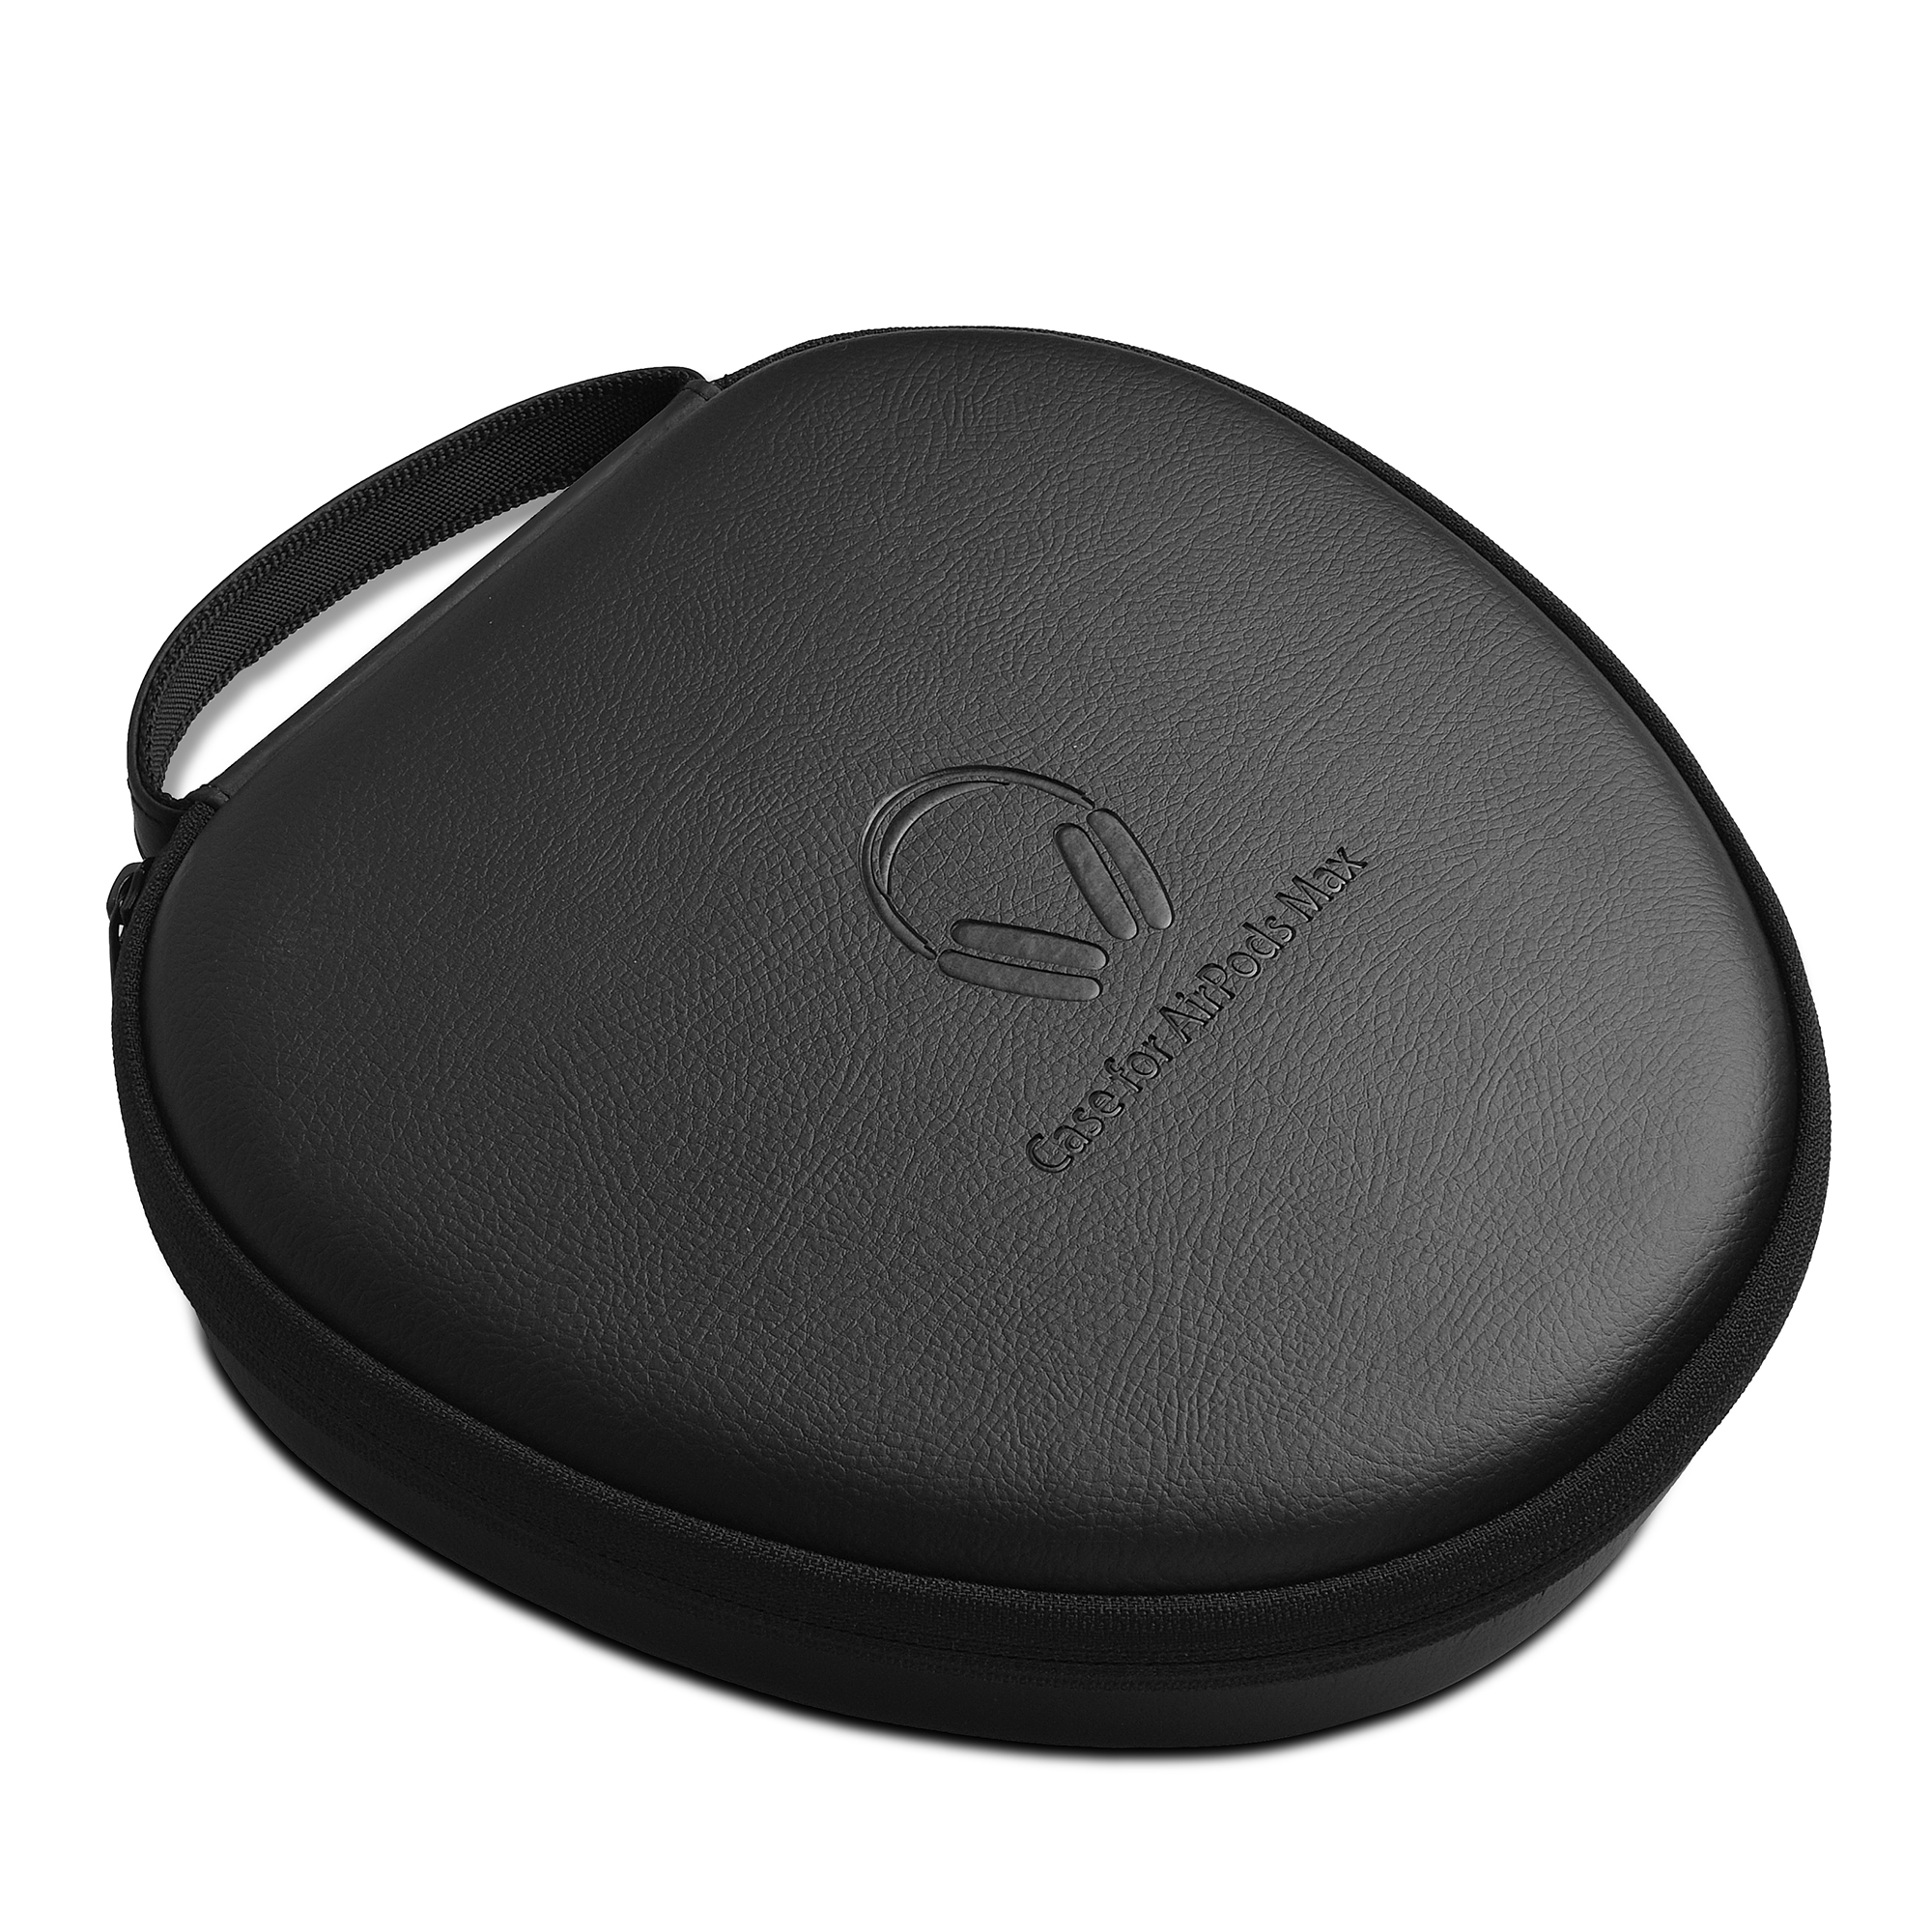 WiWU 适用于Airpod Max智能耳机套 (https://www.wiwu.net.cn/) AirPods 保护壳 第5张